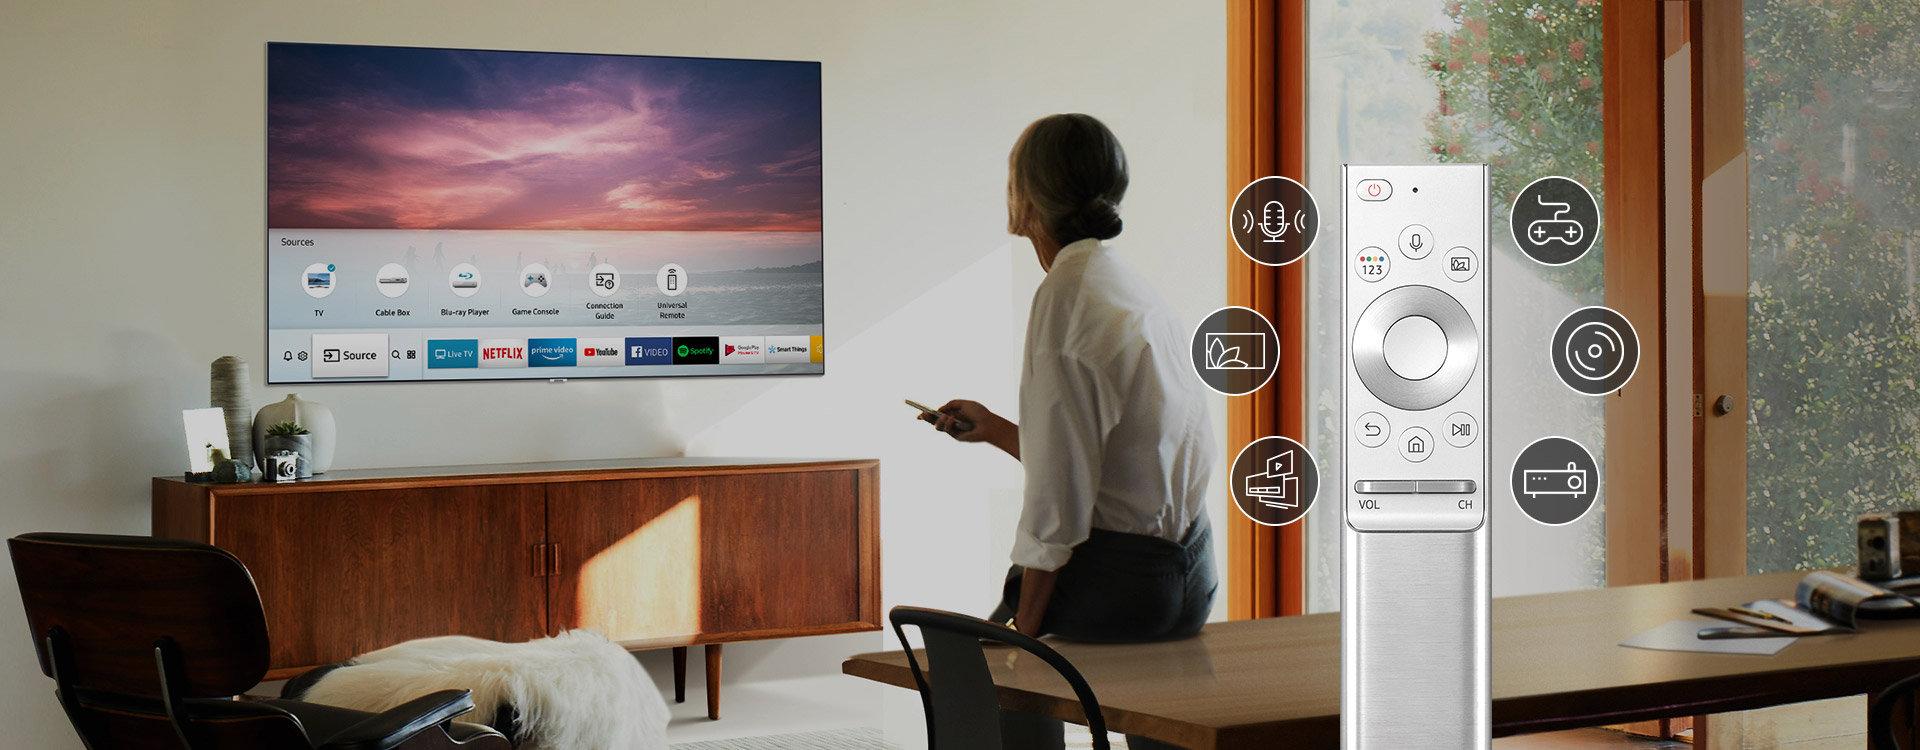 2018-qled-tv-one-remote-control.jpg